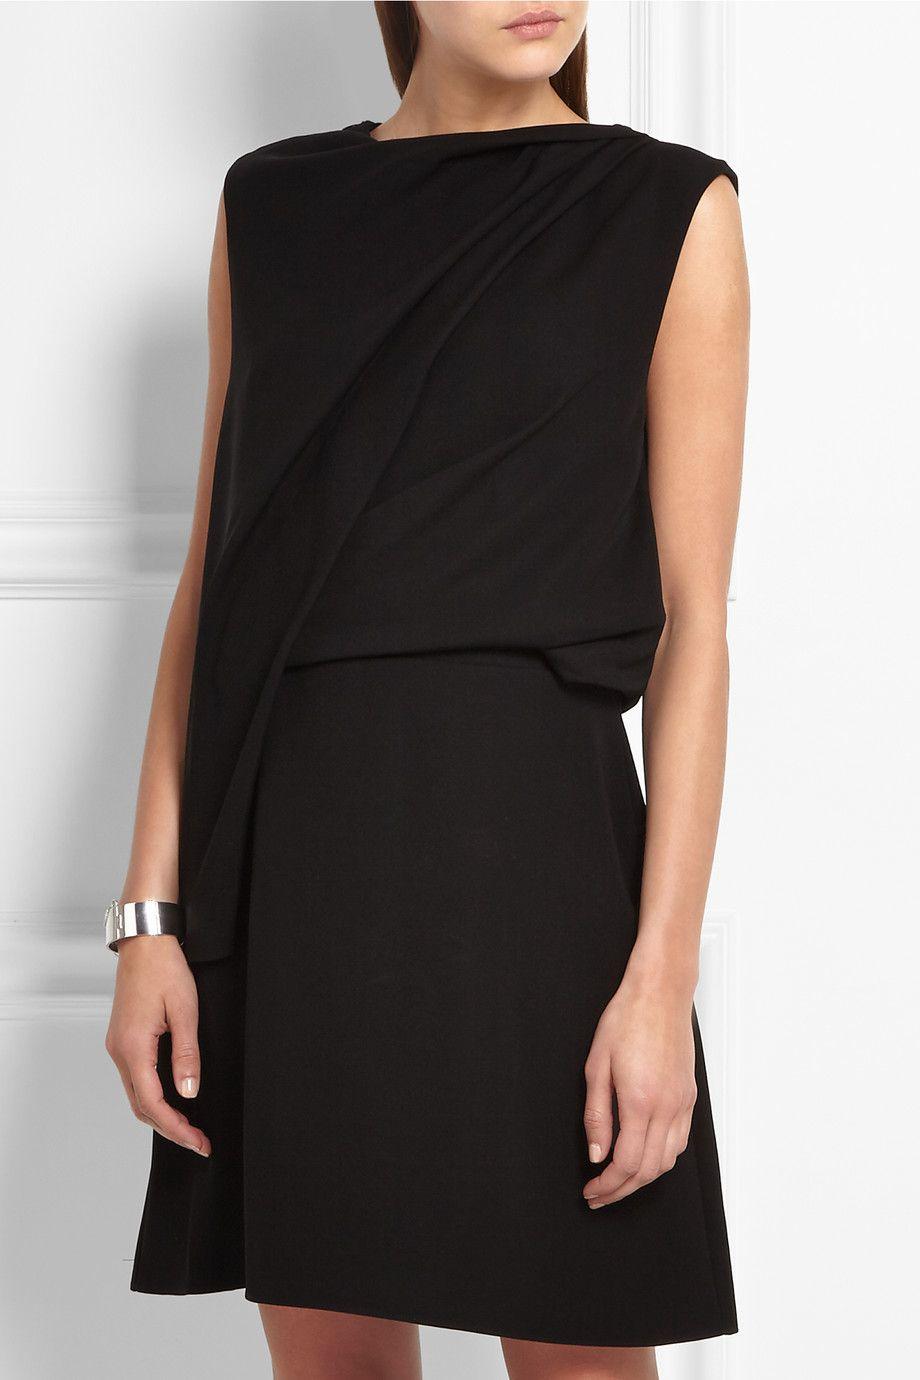 McQ Alexander McQueen - Draped crepe mini dress